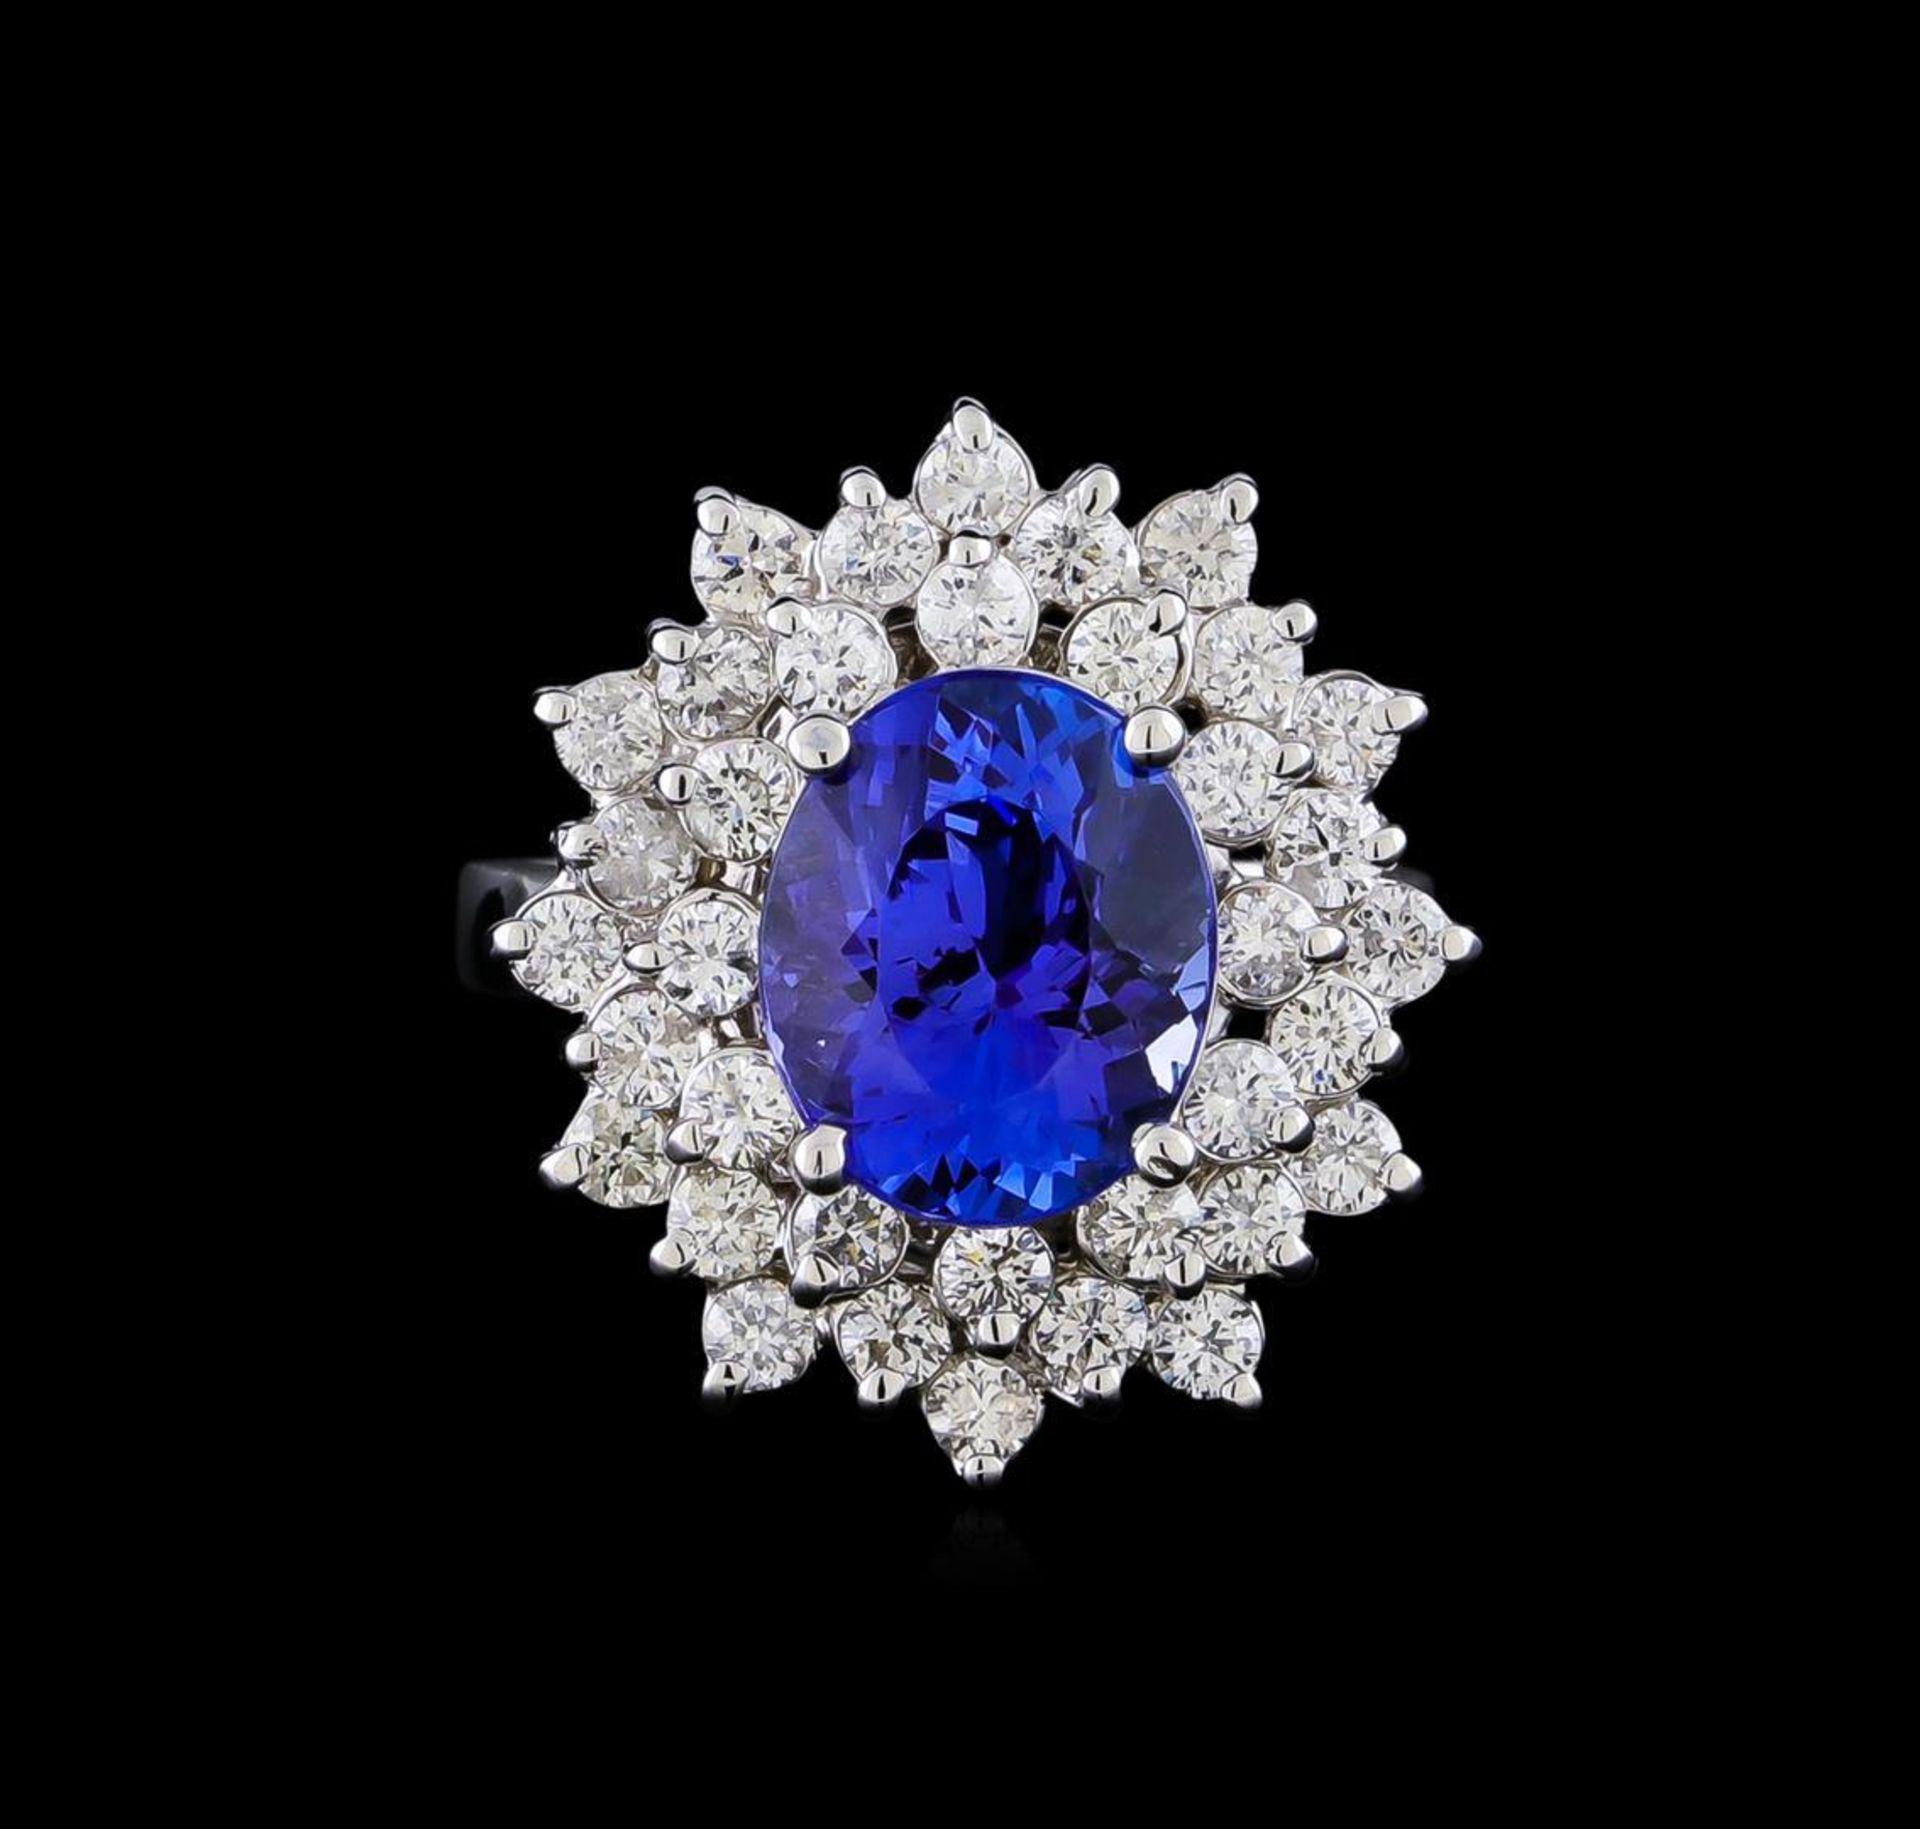 4.01 ctw Tanzanite and Diamond Ring - 14KT White Gold - Image 2 of 5